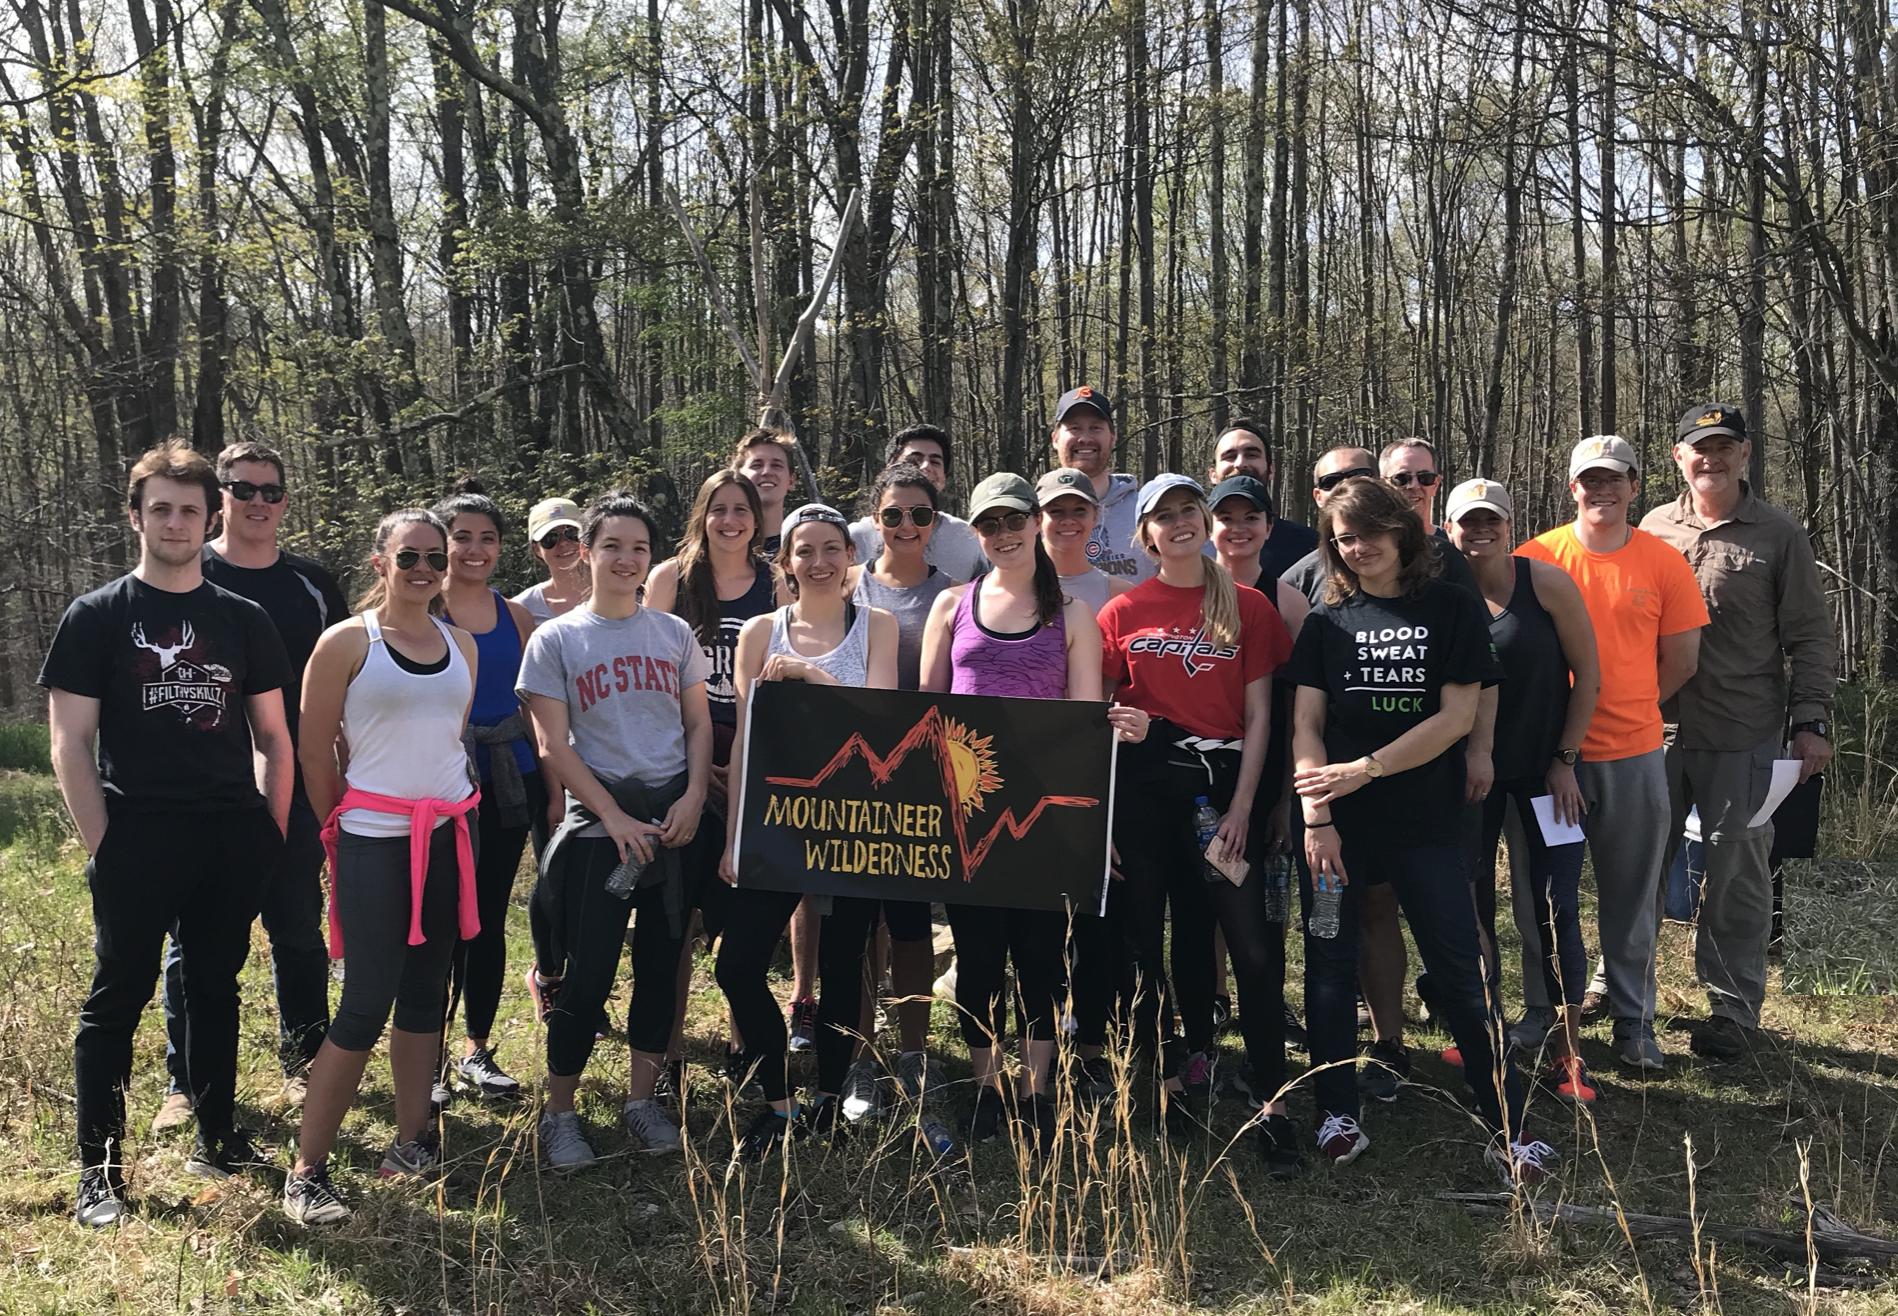 Outdoor Group Programs - Team Building, Reunion Activities, Presentations